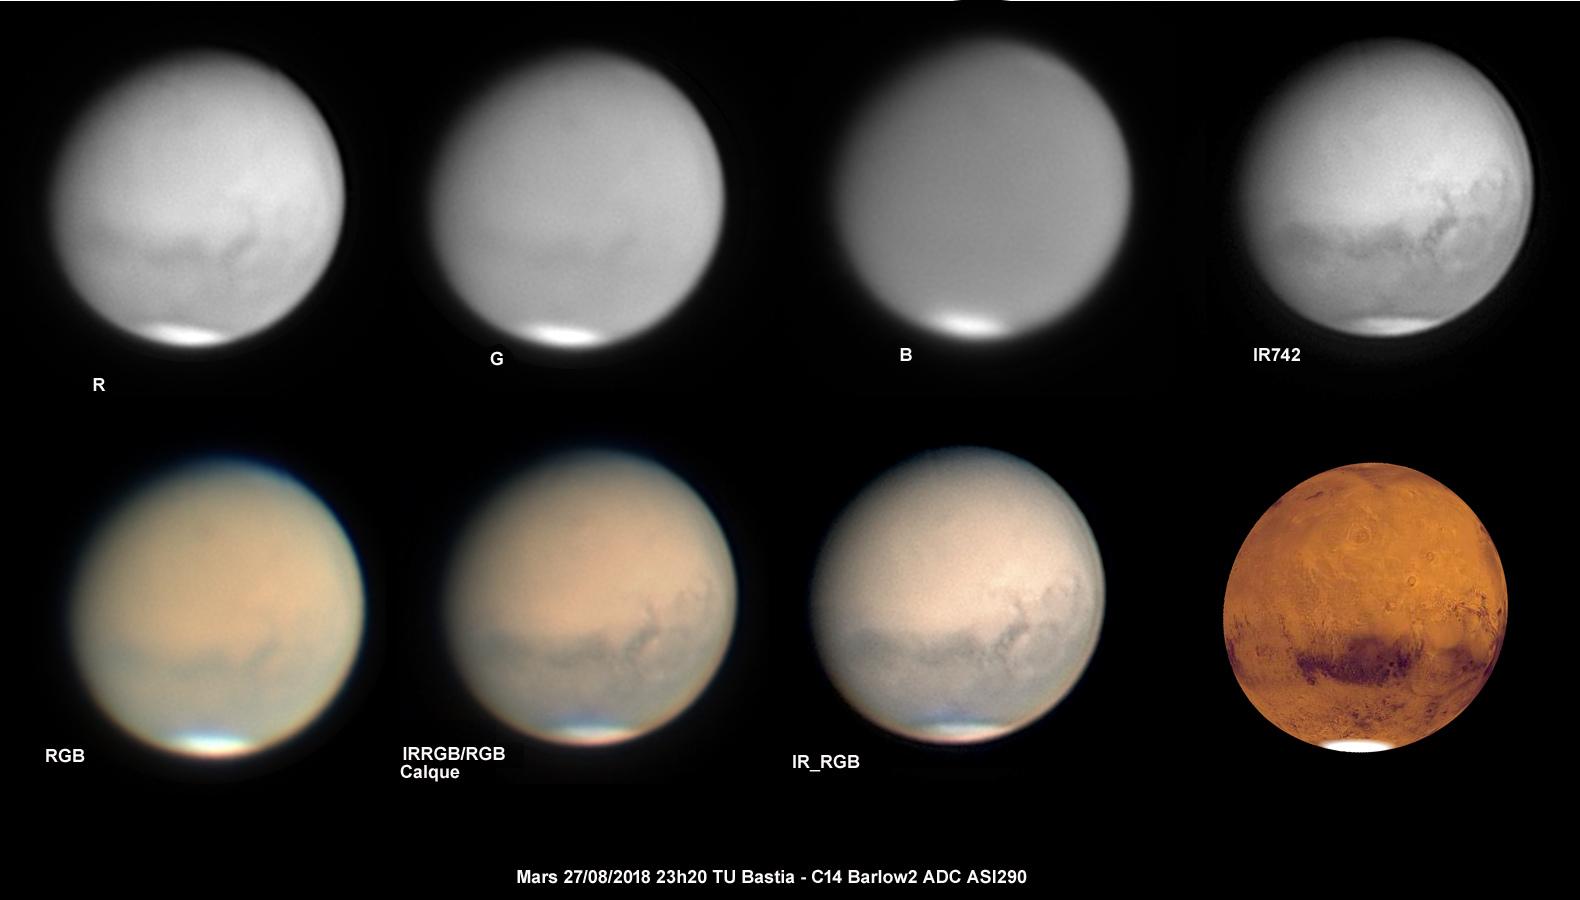 Mars_27_08_2018_23_20_PLANC.jpg